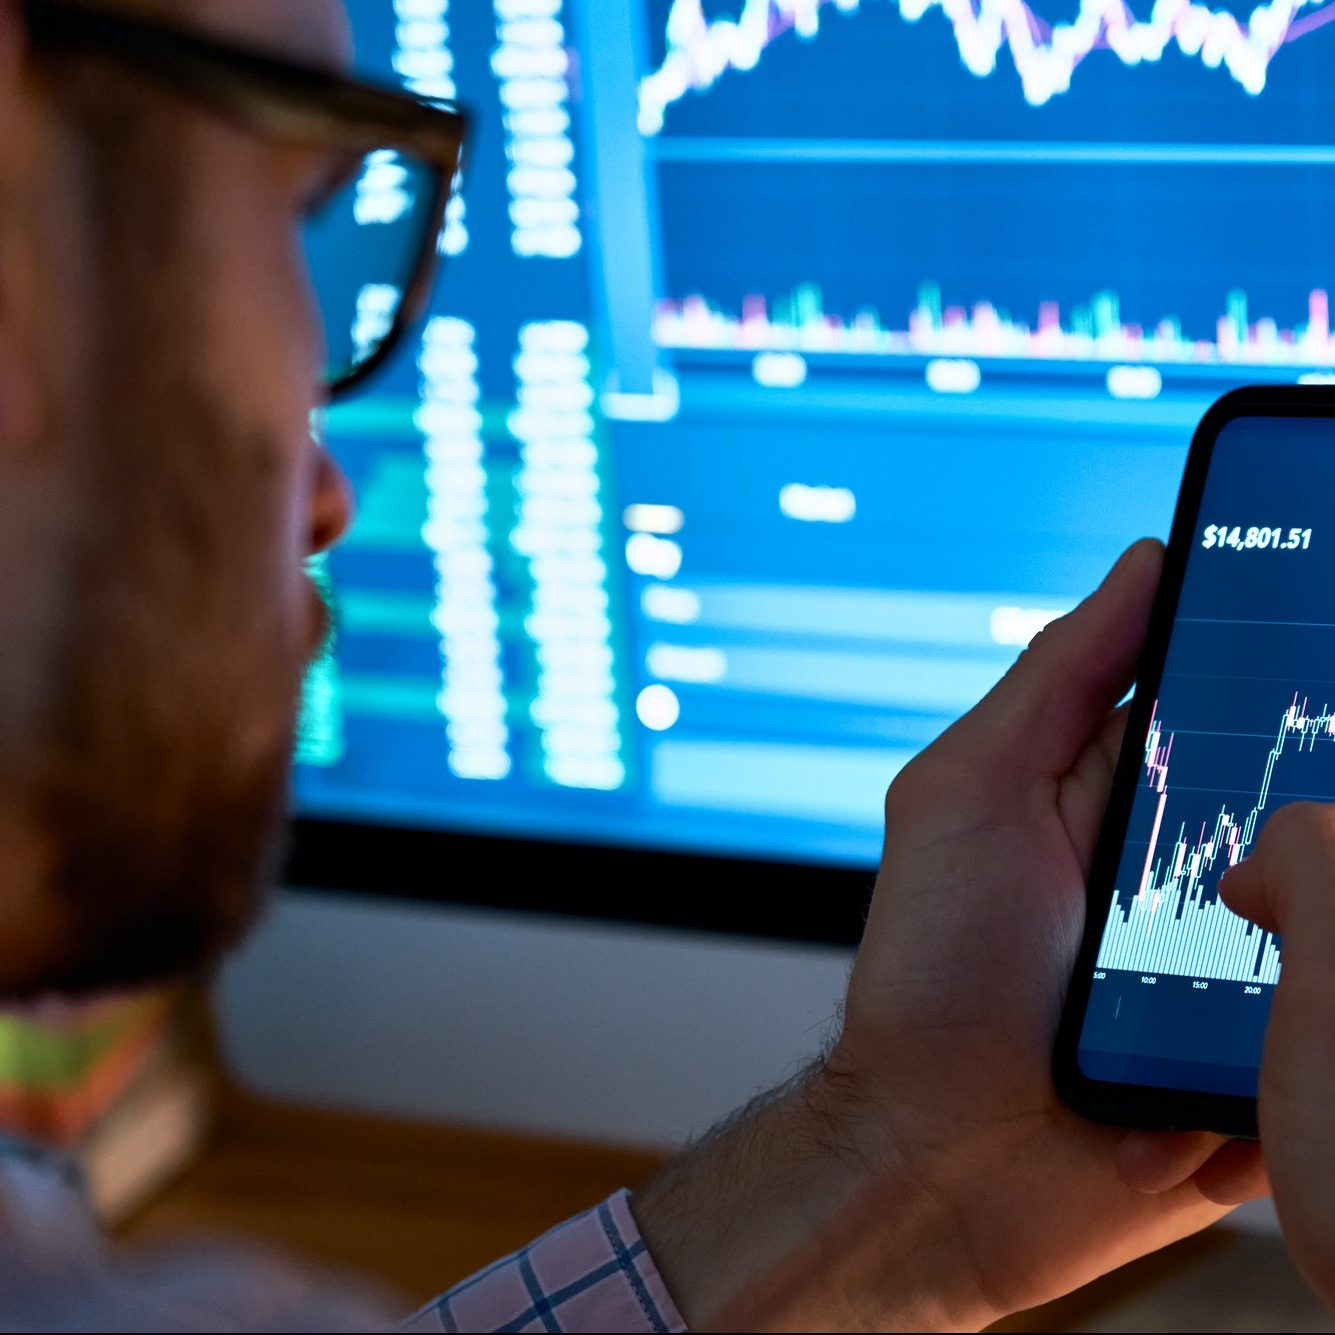 Trader using mobile phone app analytics for stock trading graph data analysis.